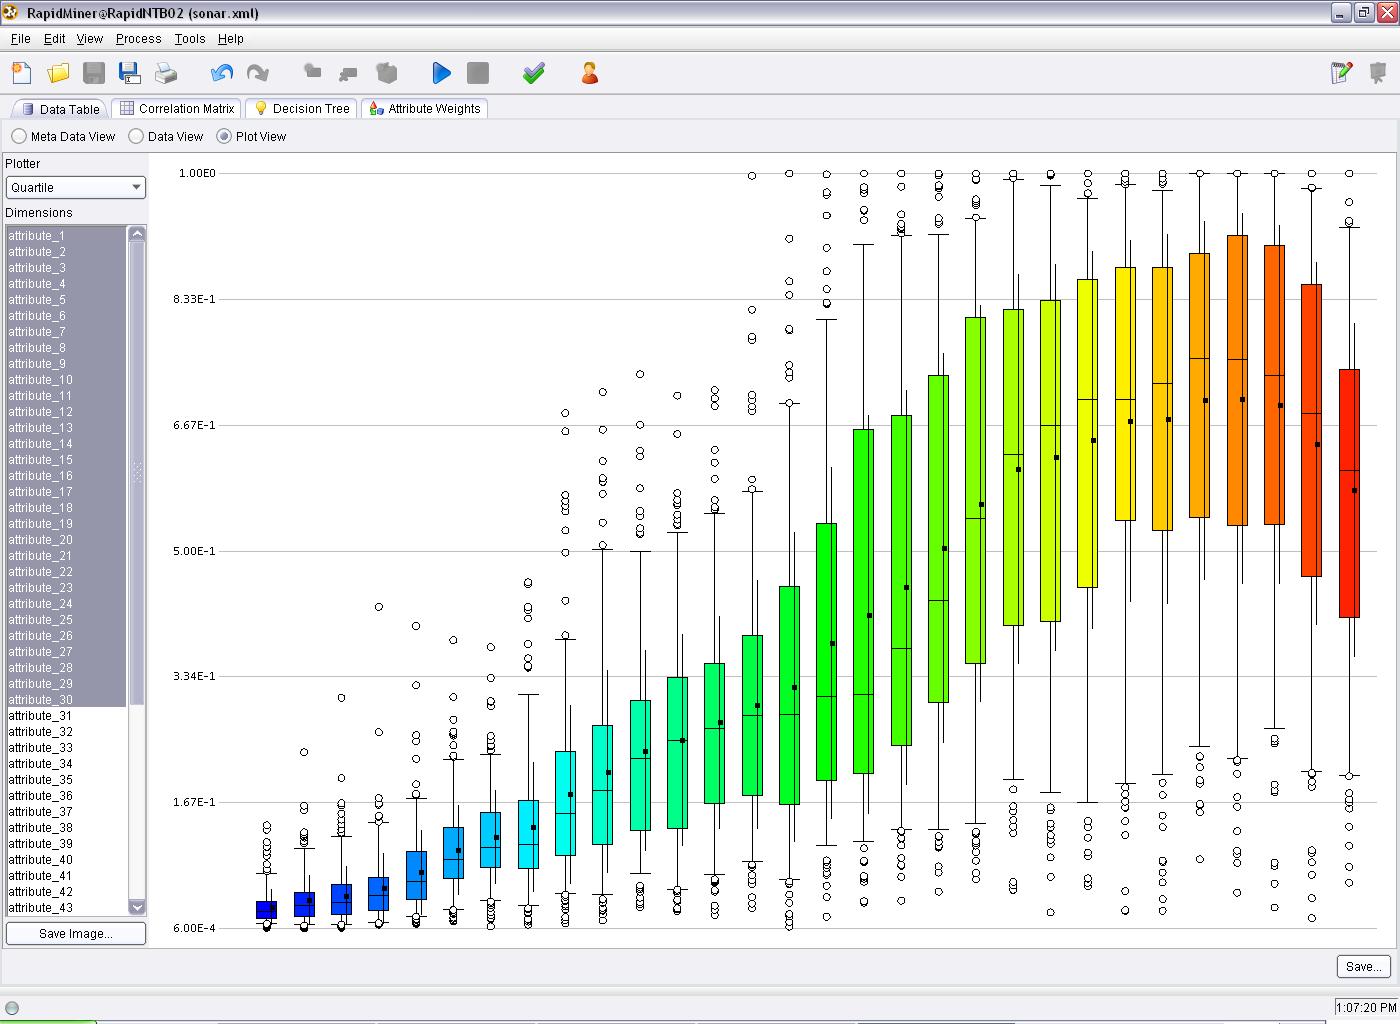 Data representation in RapidMiner